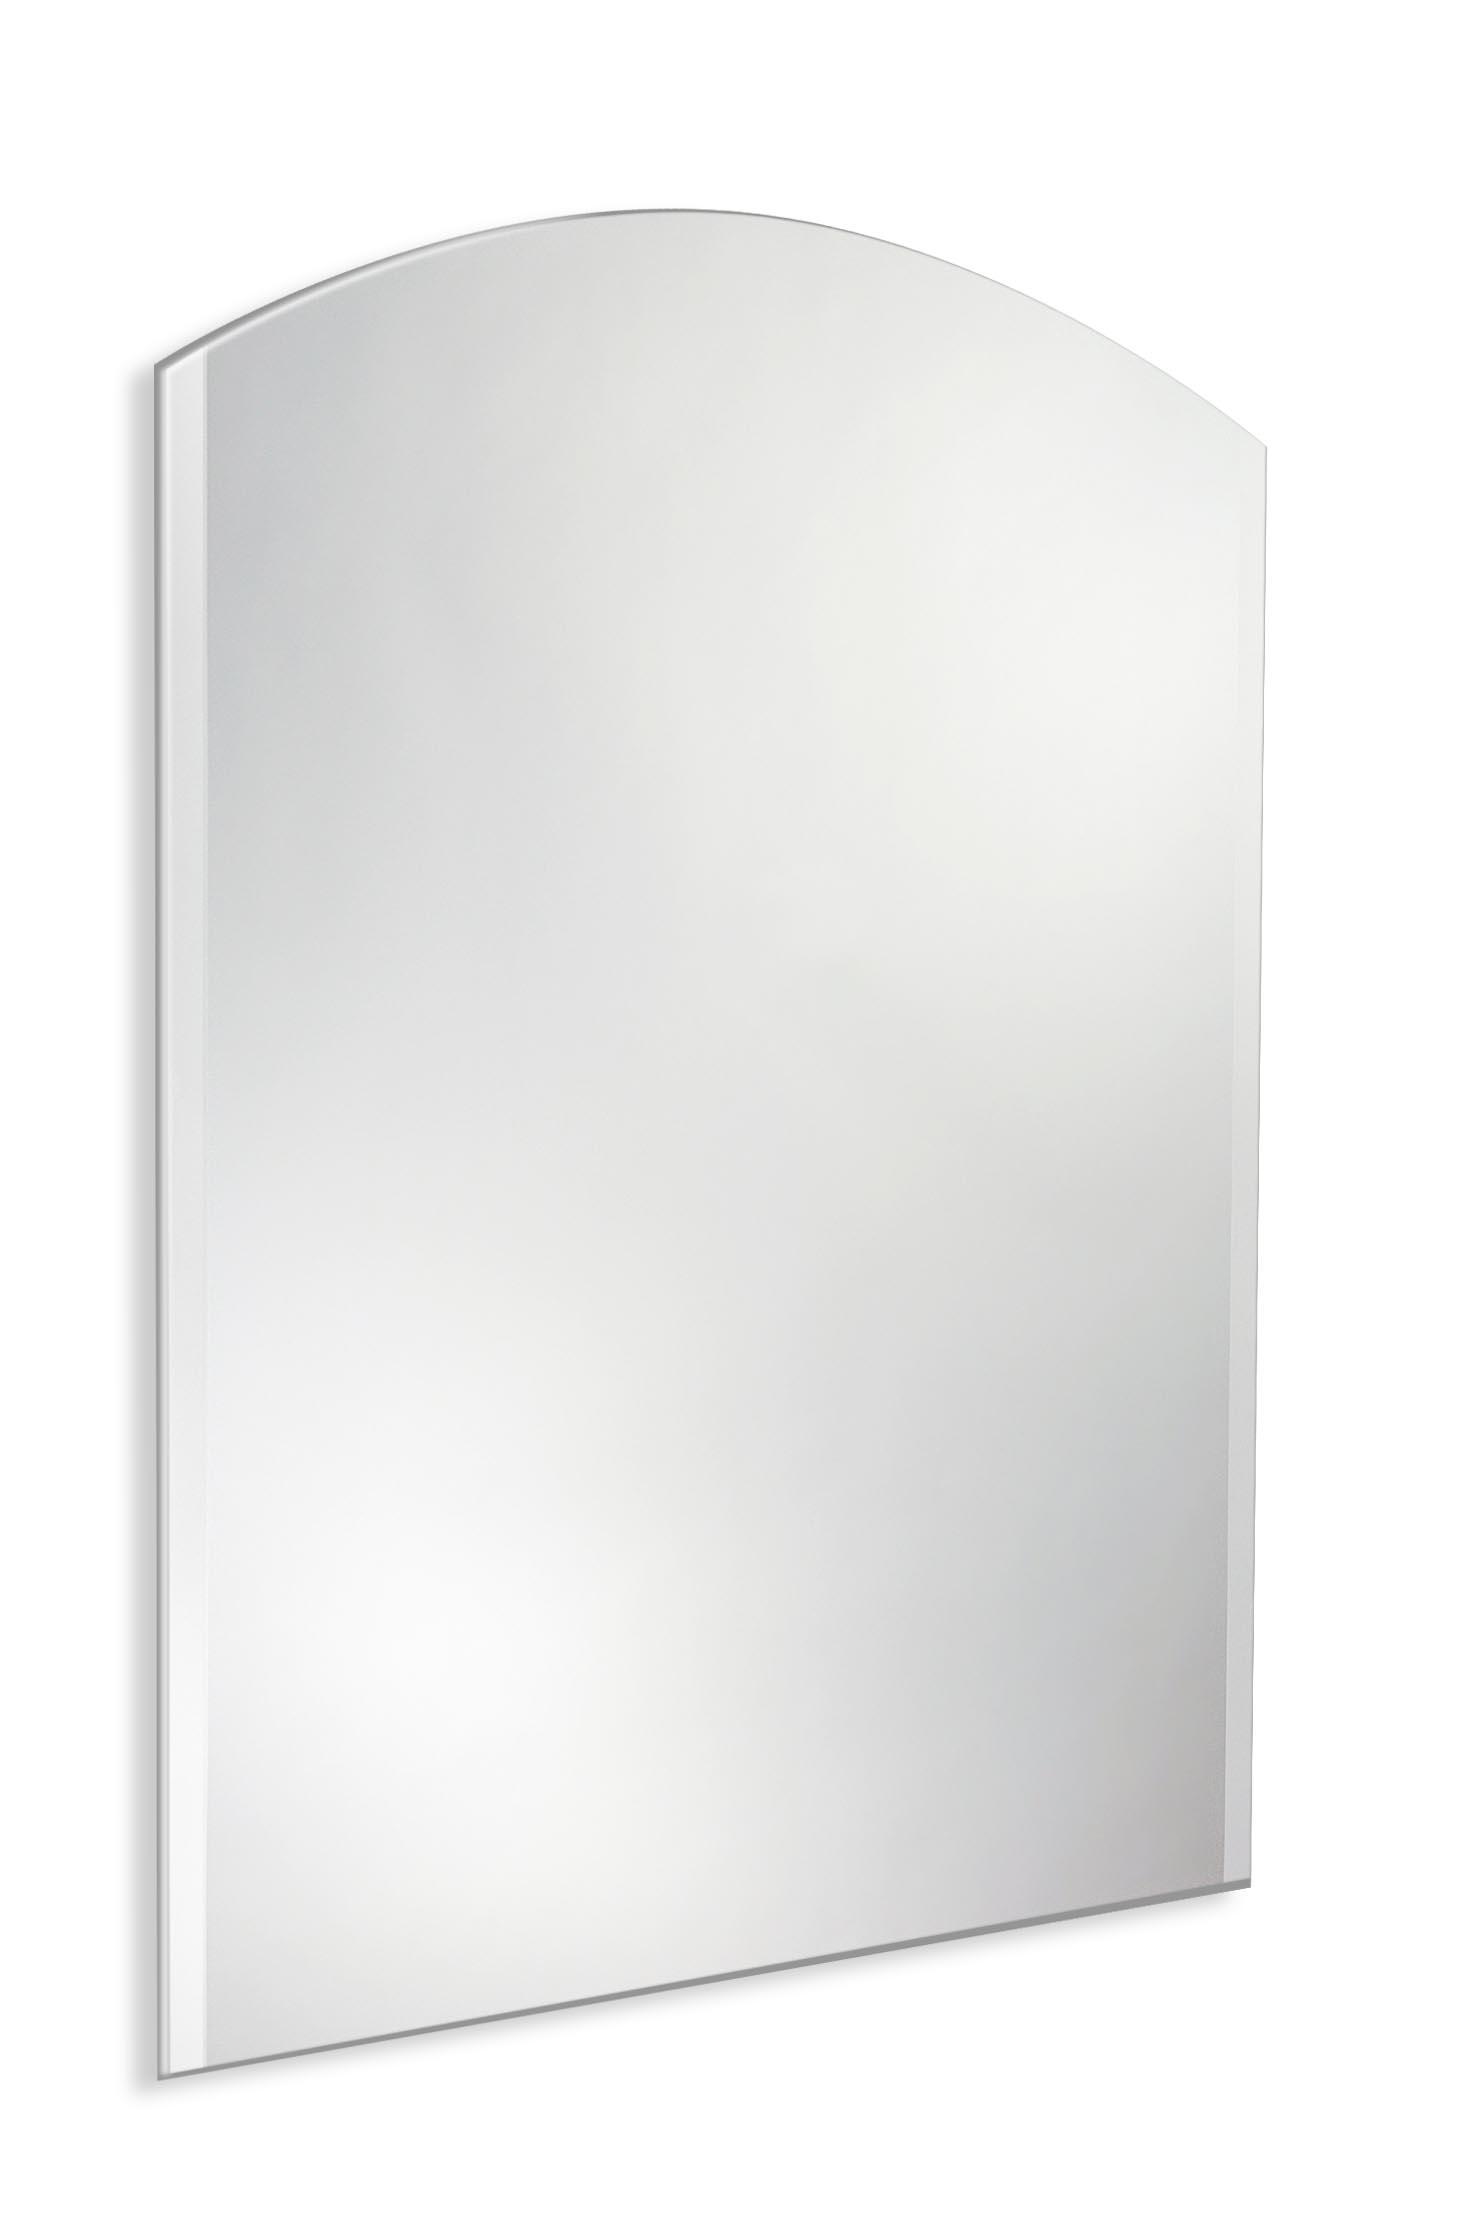 Romance 75 x 60 cm Zrcadlo Amirro